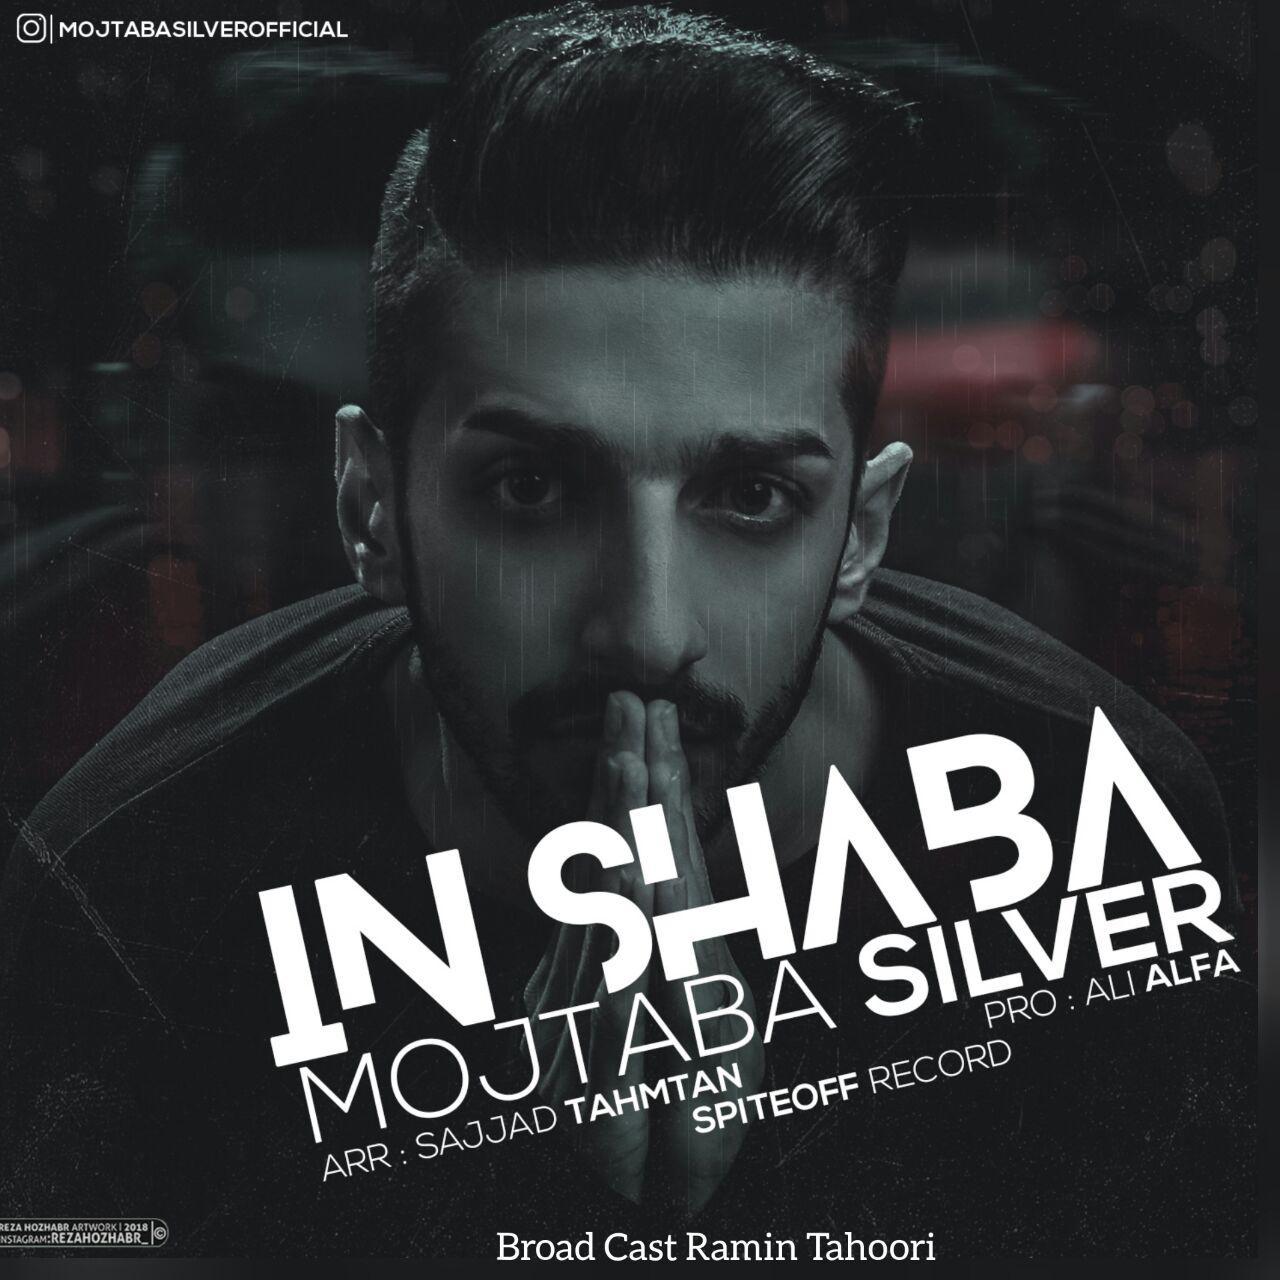 Mojtaba Silver – In Shaba